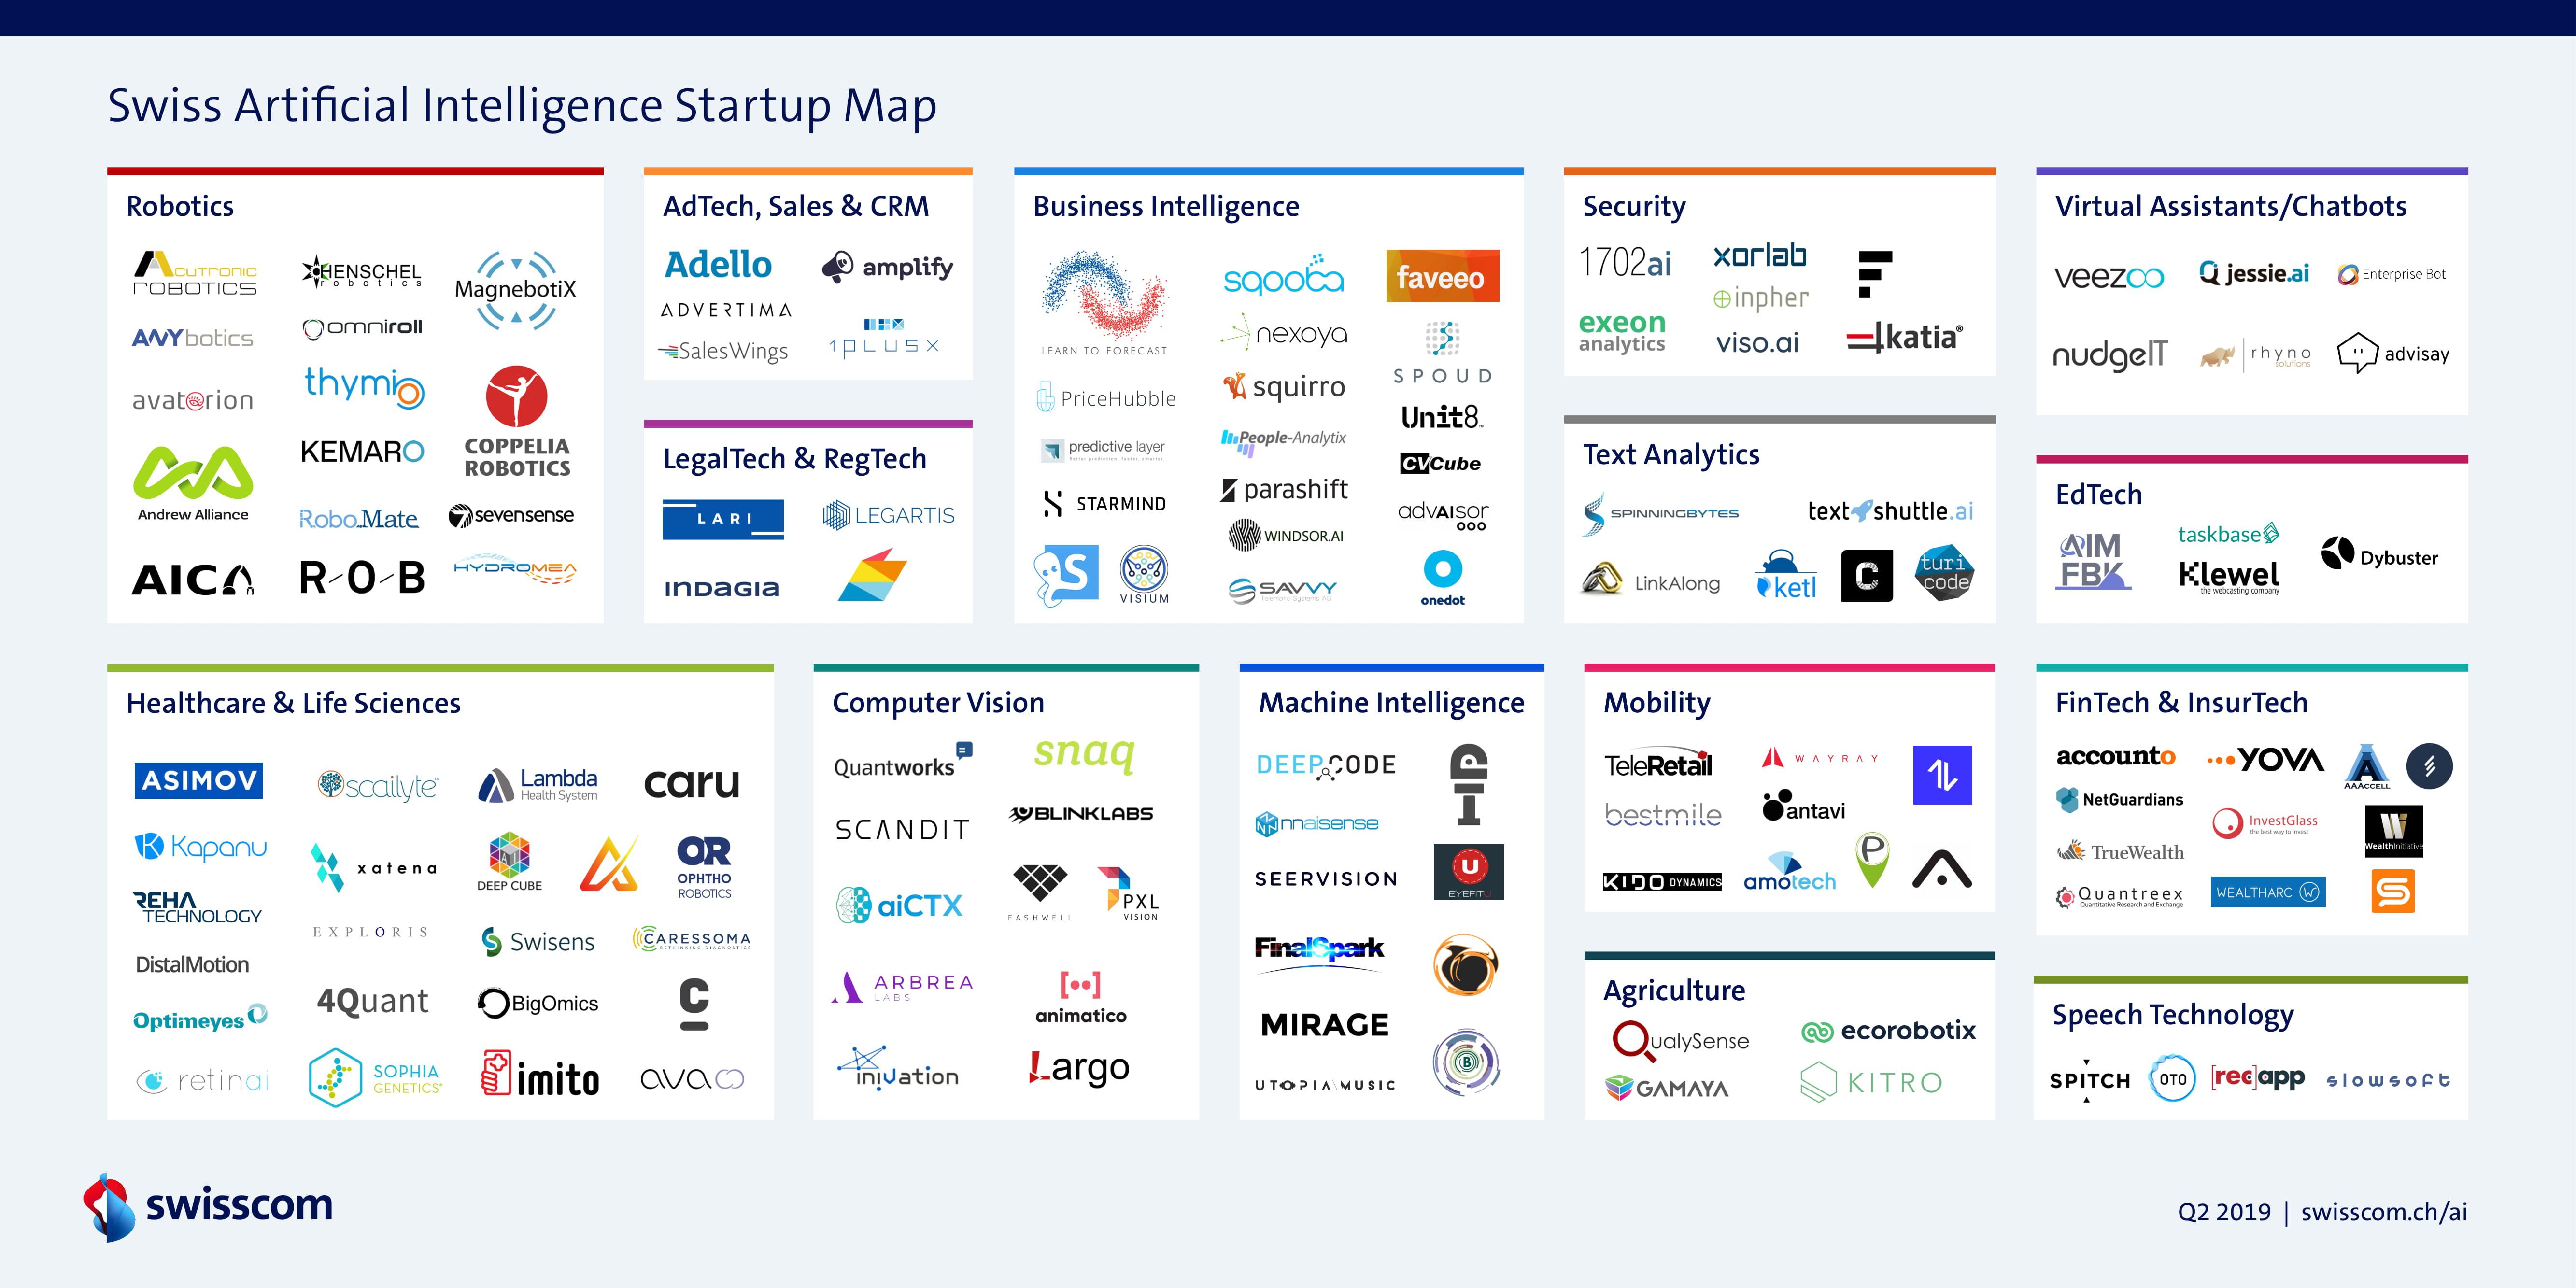 Swiss Artificial Intelligence Startup Map